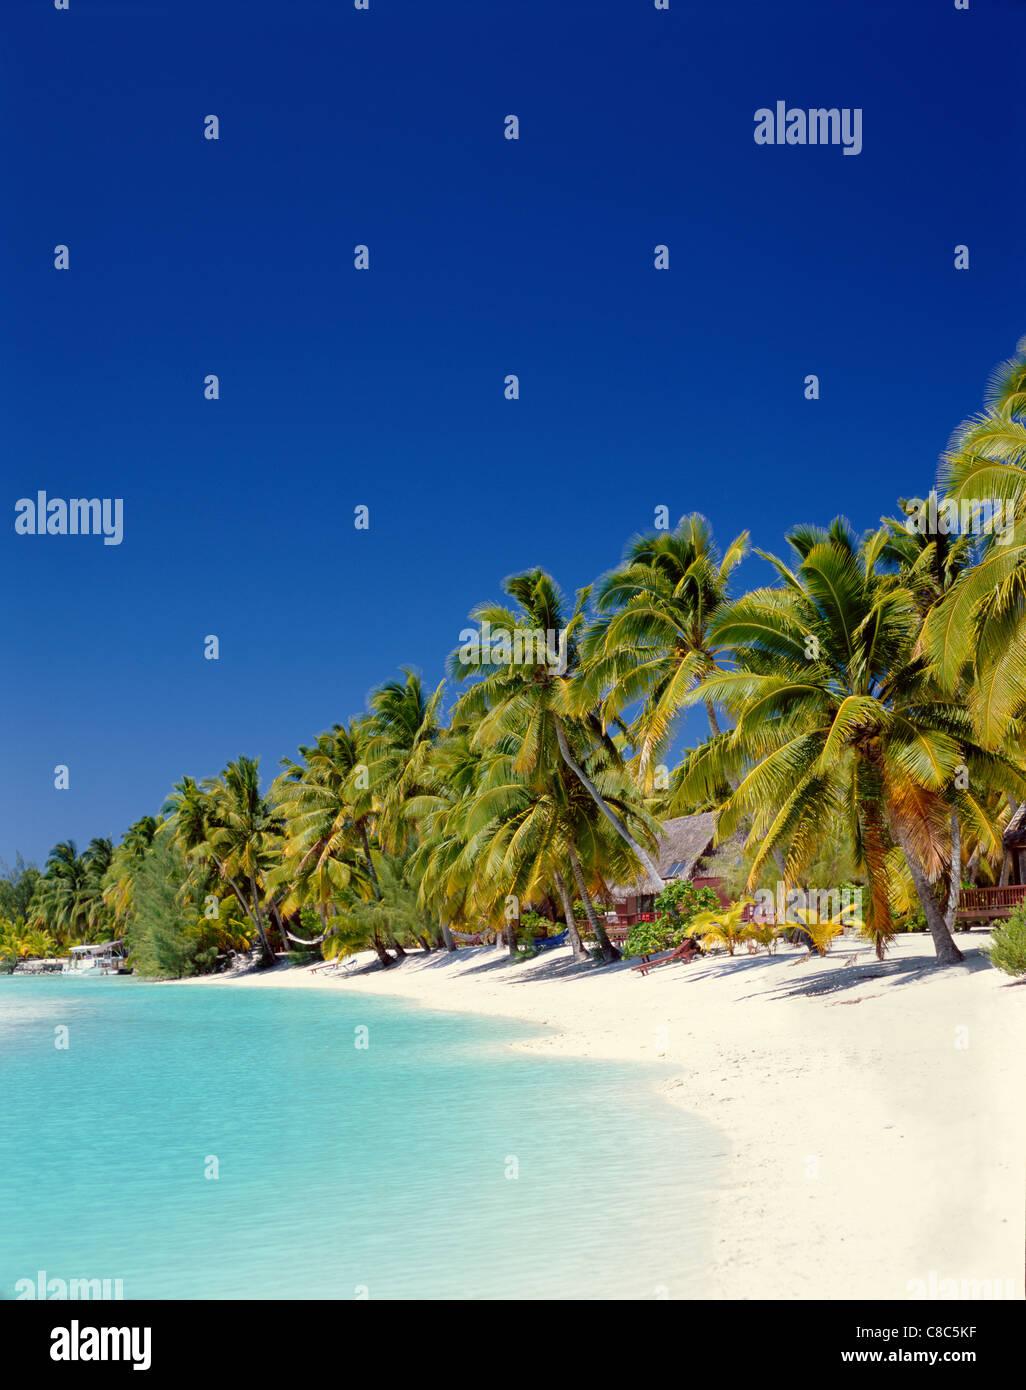 Atoll, Palmen & Tropical Beach, Insel Aitutaki, Cook-Inseln, Polynesien Stockbild